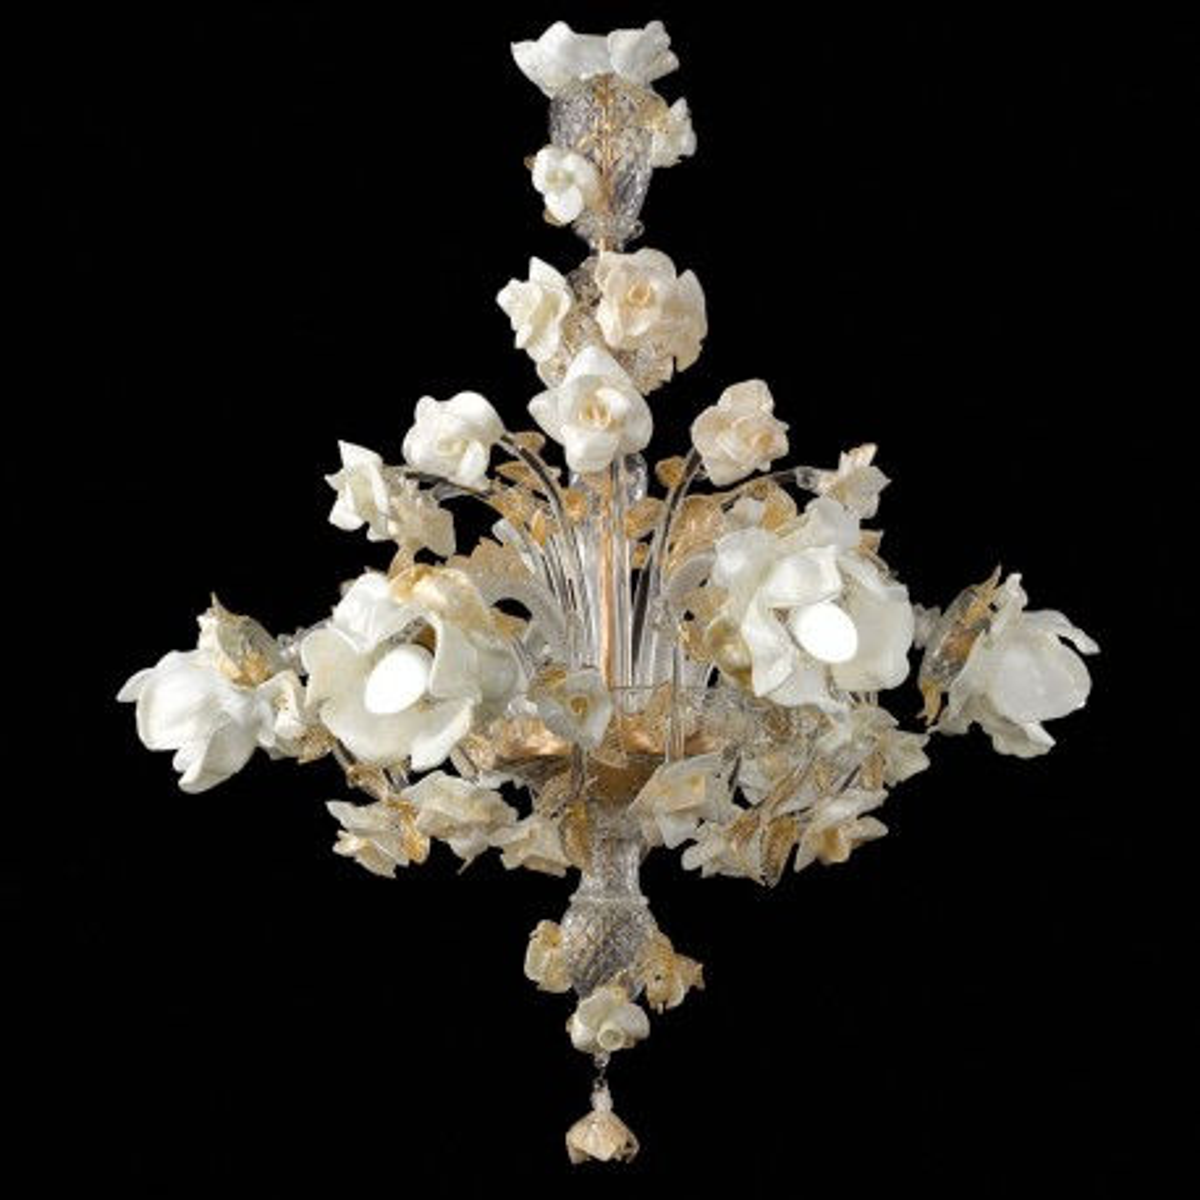 """Rose bianche"" Murano glas Kronleuchter - 6 flammig"